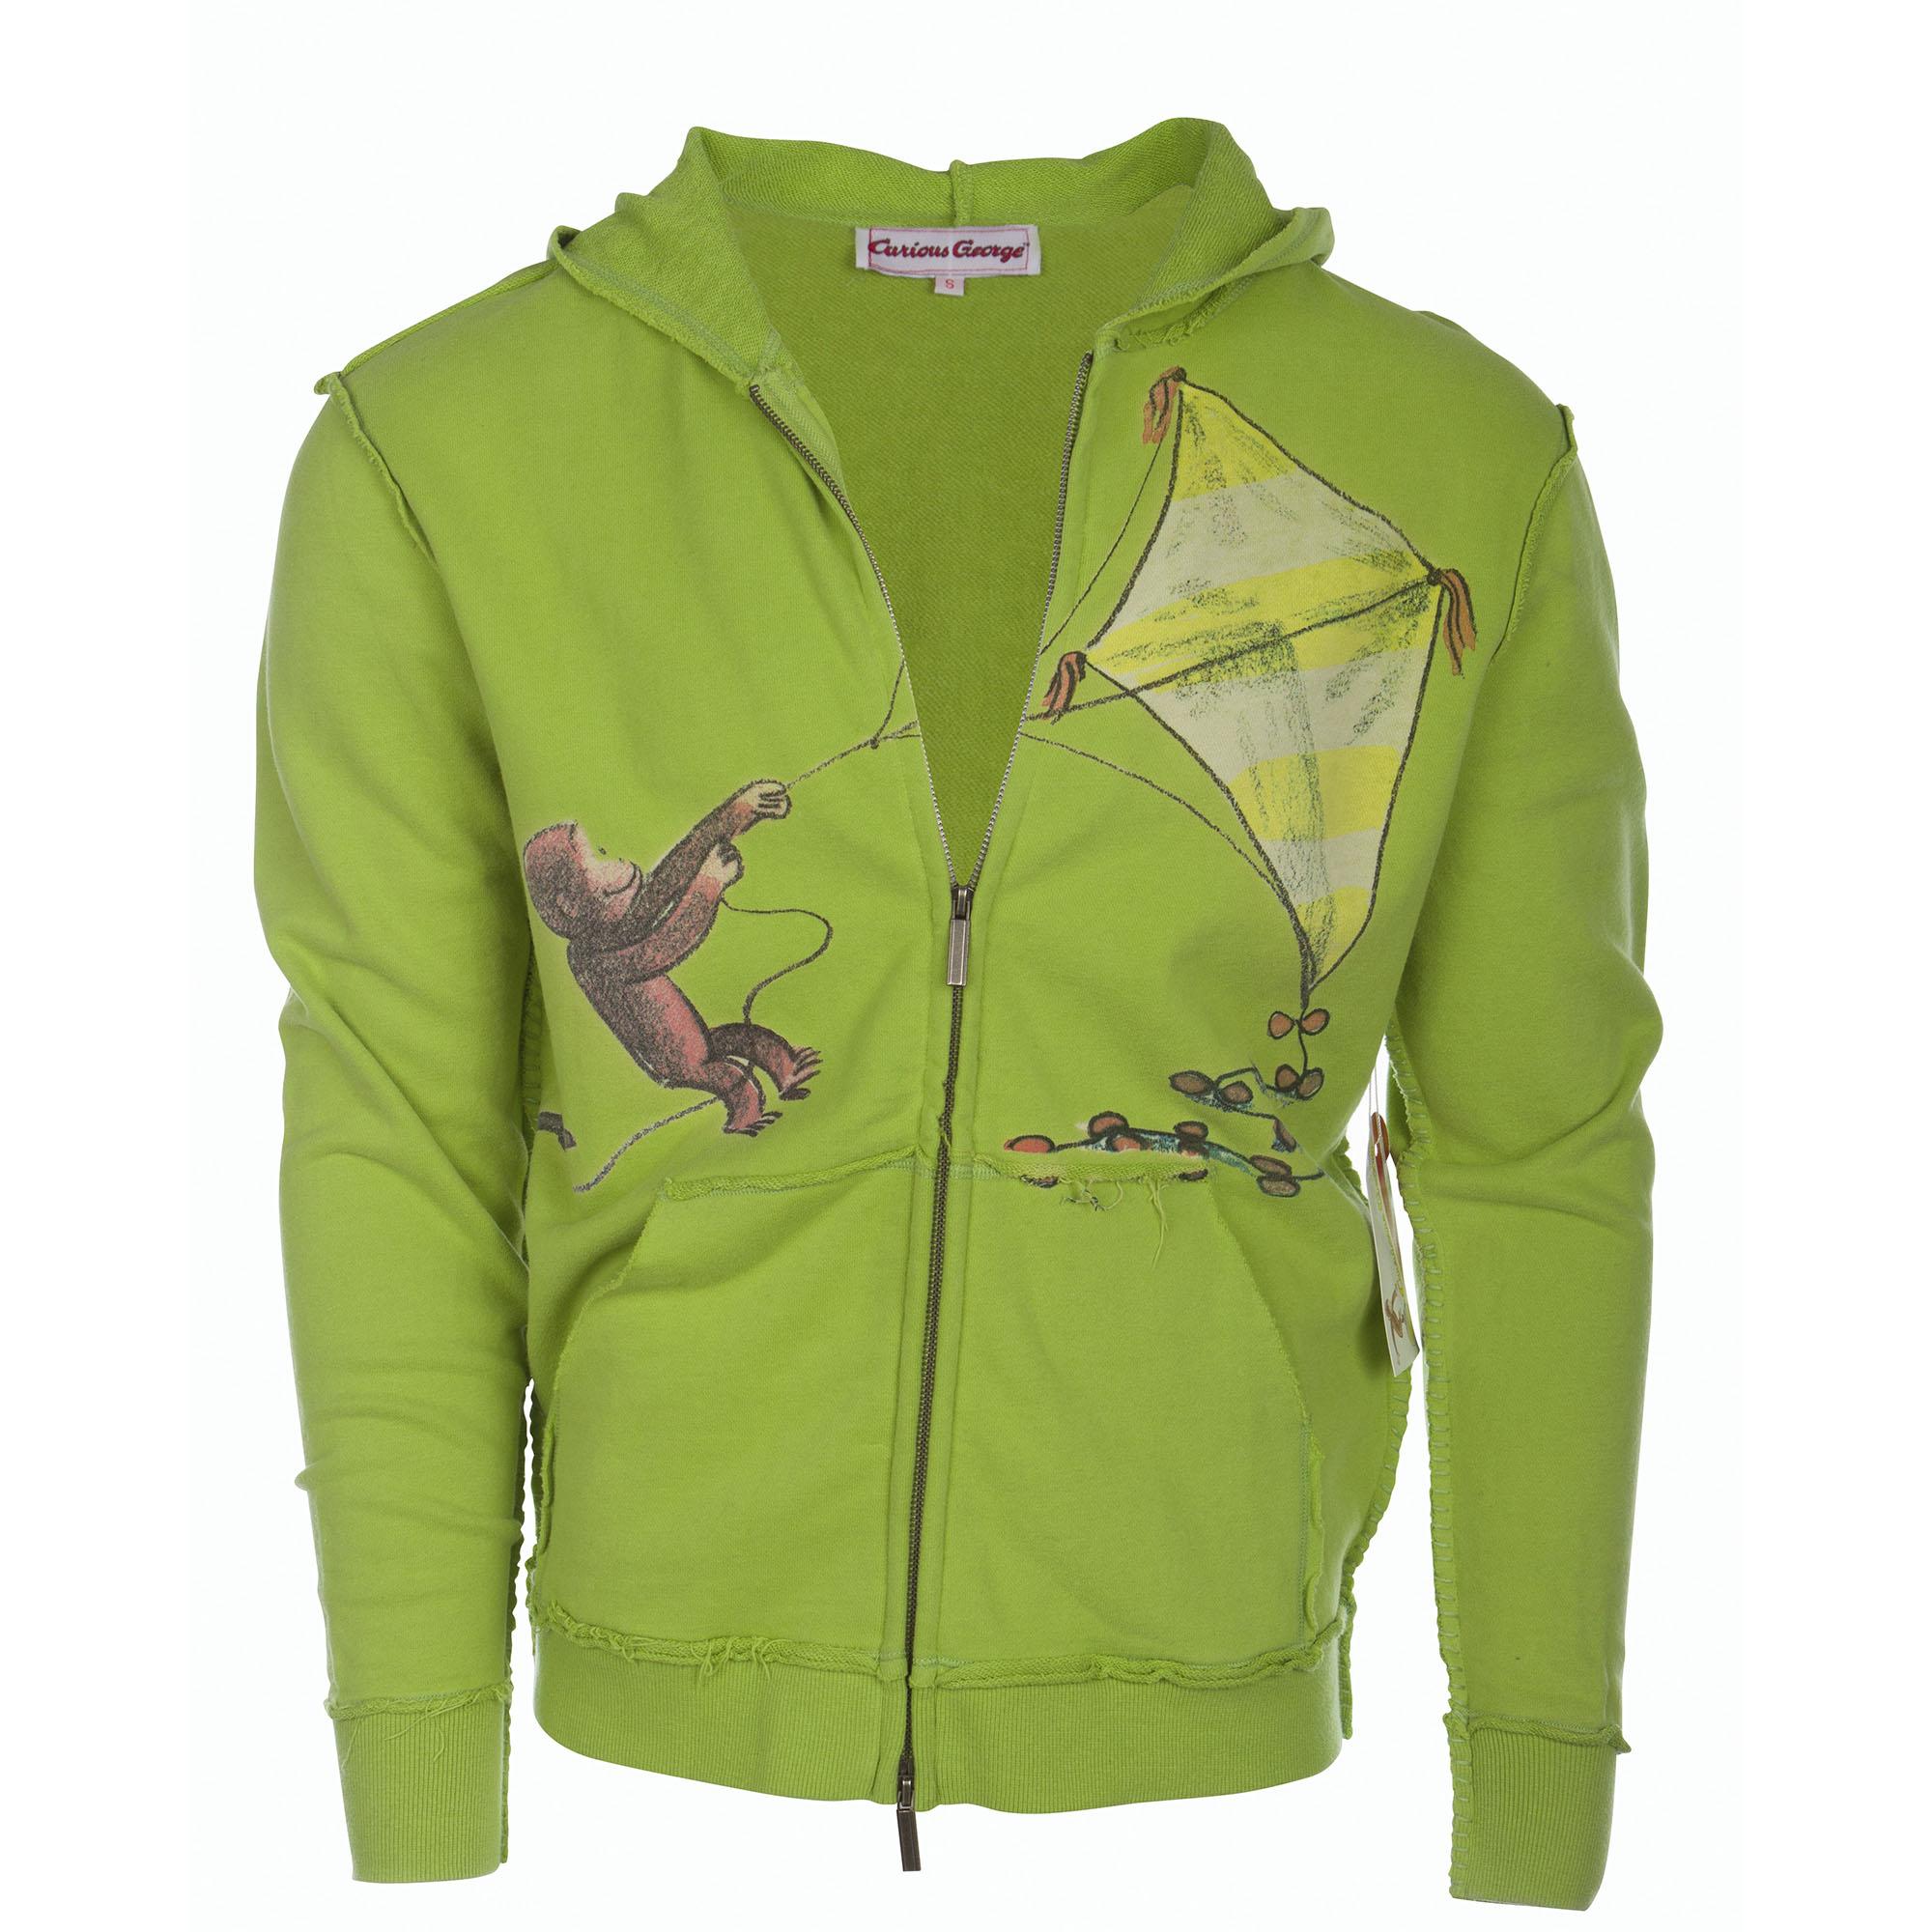 Curious George SWSRT232-GREEN Curious George Men's Green Zip Hoodie Kite Design